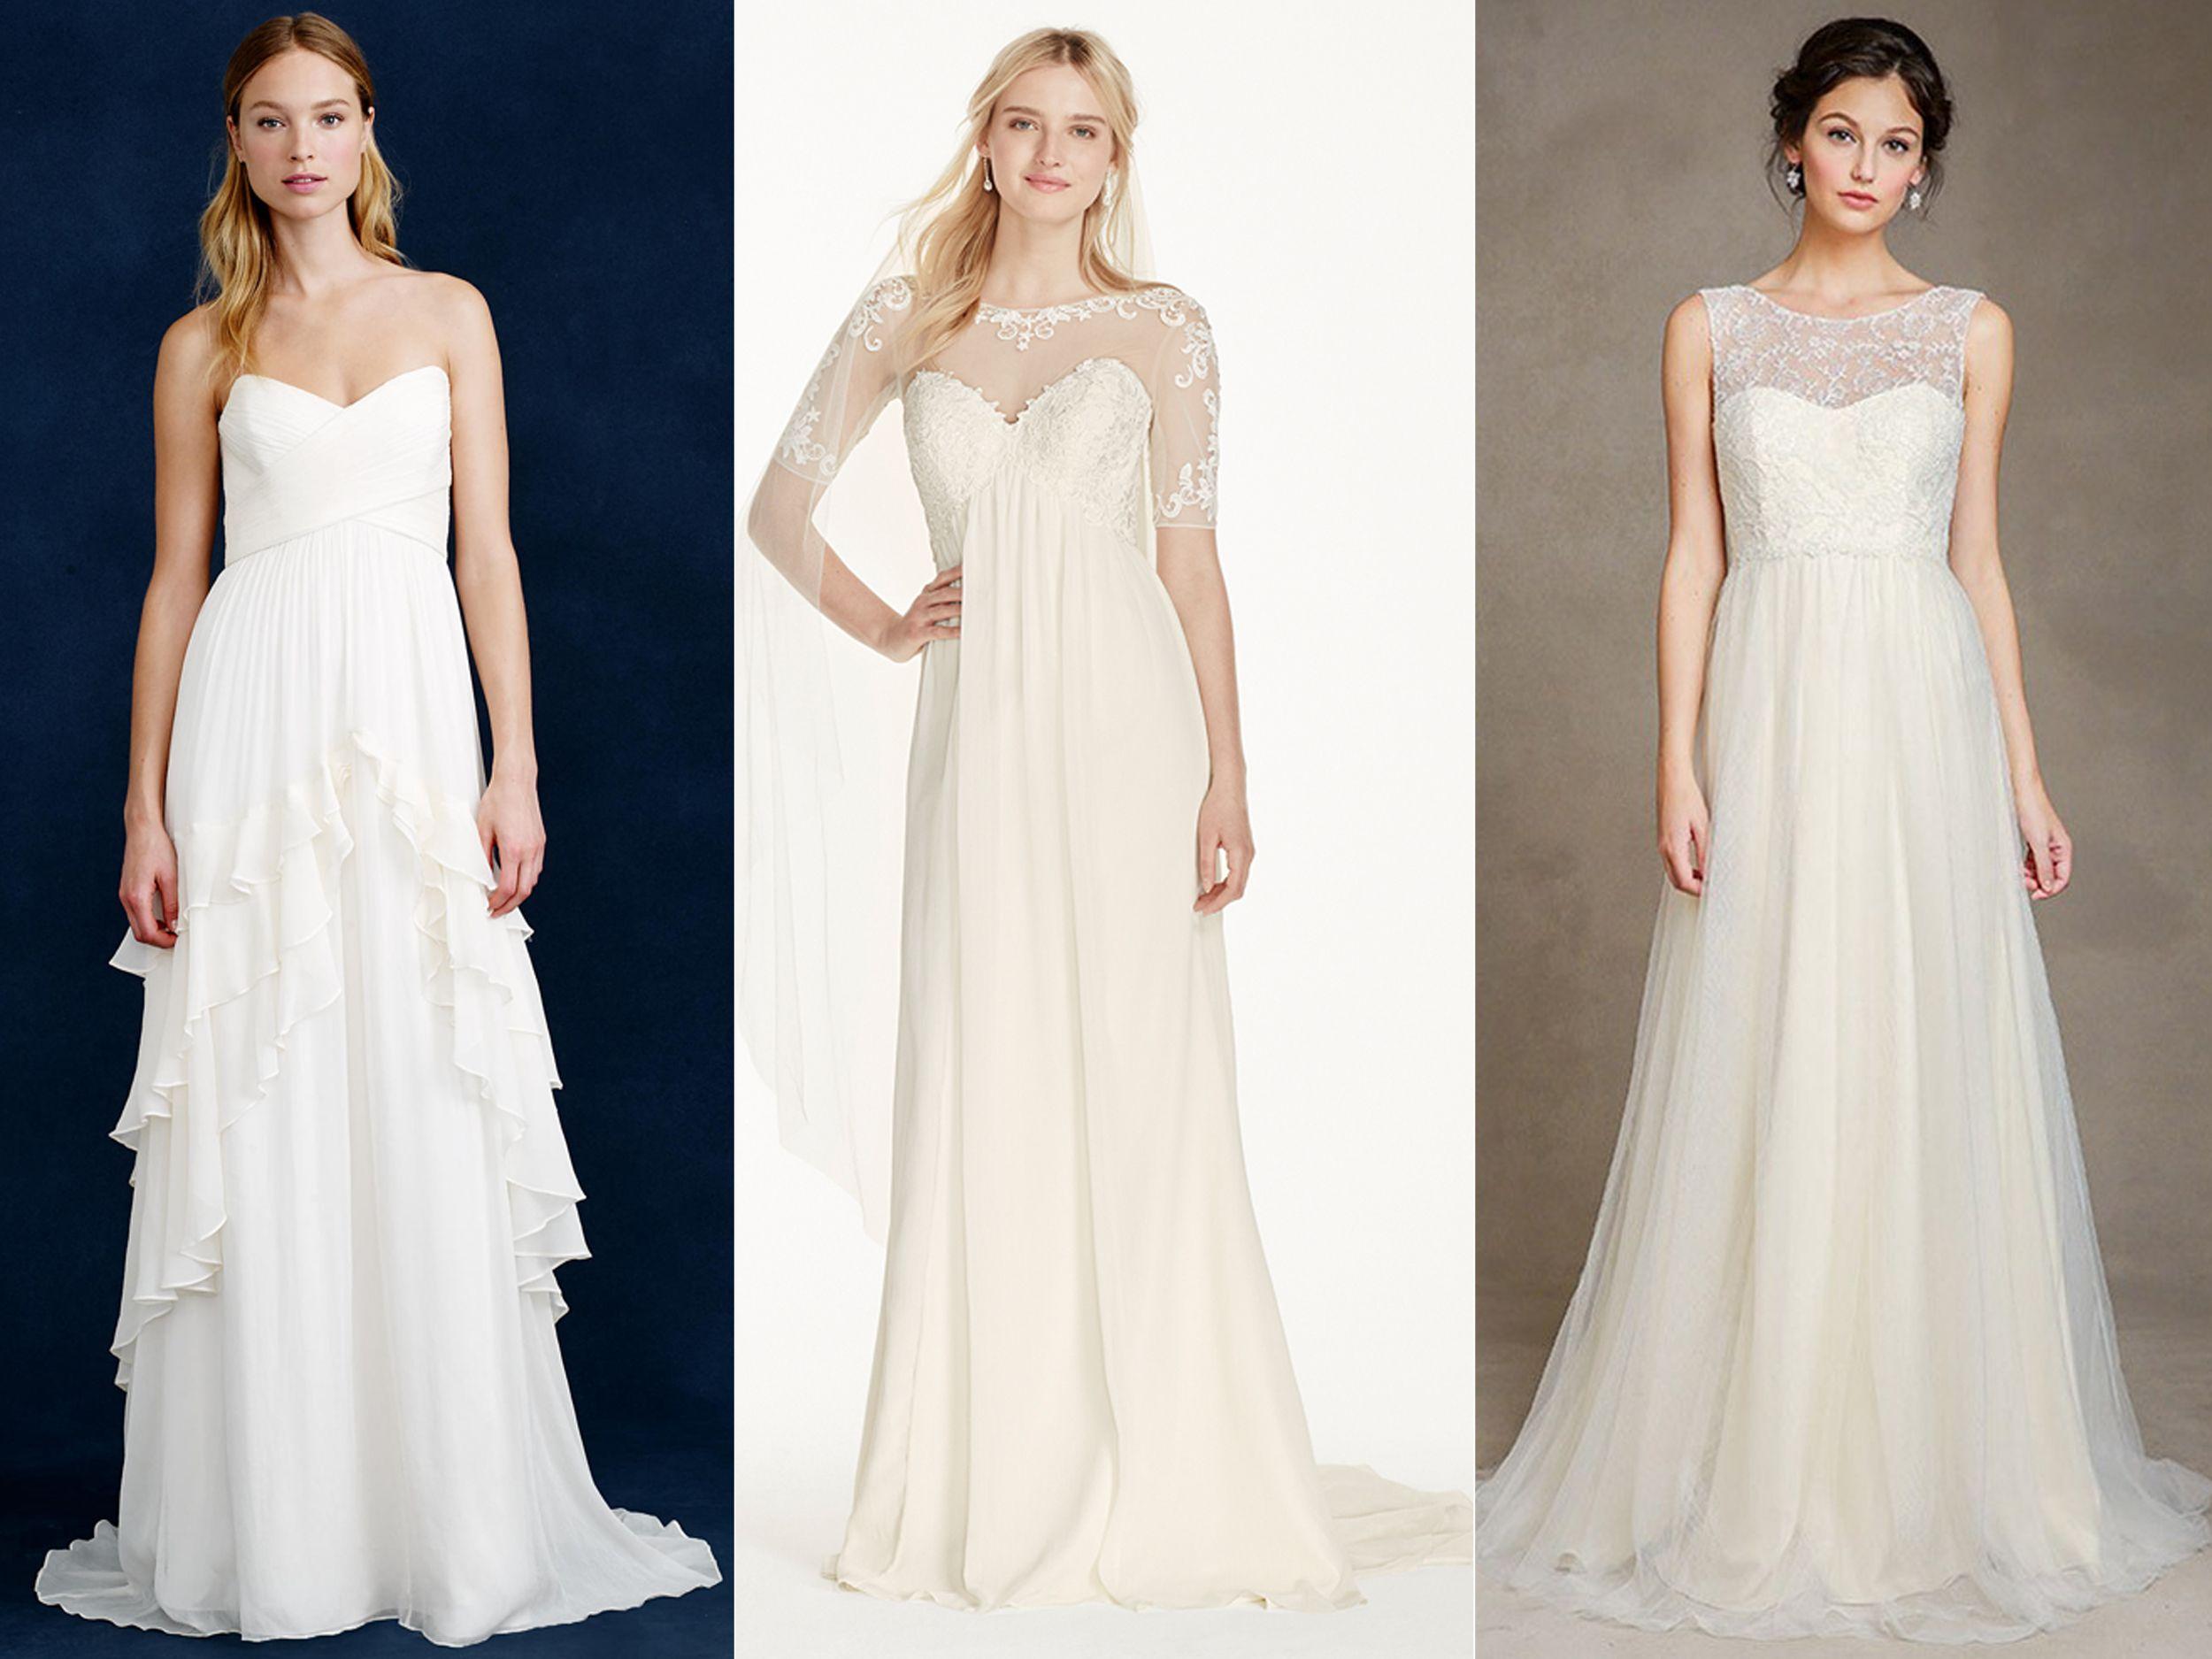 15 Wedding Dresses Under 1,000 (With images) Wedding